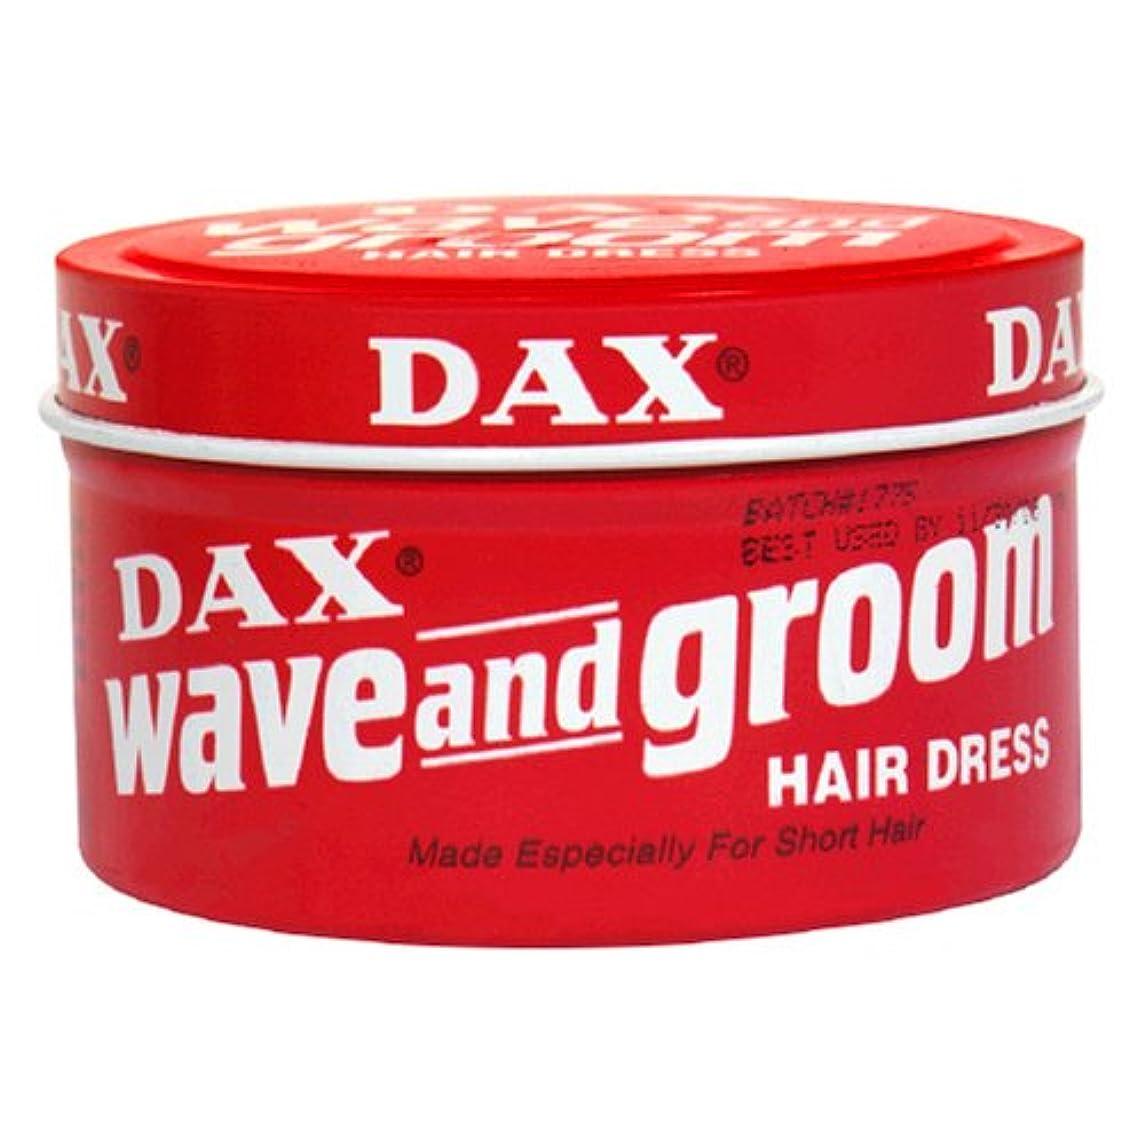 Dax Wave & Groom Hair Dress 99 gm Jar (Case of 6) (並行輸入品)